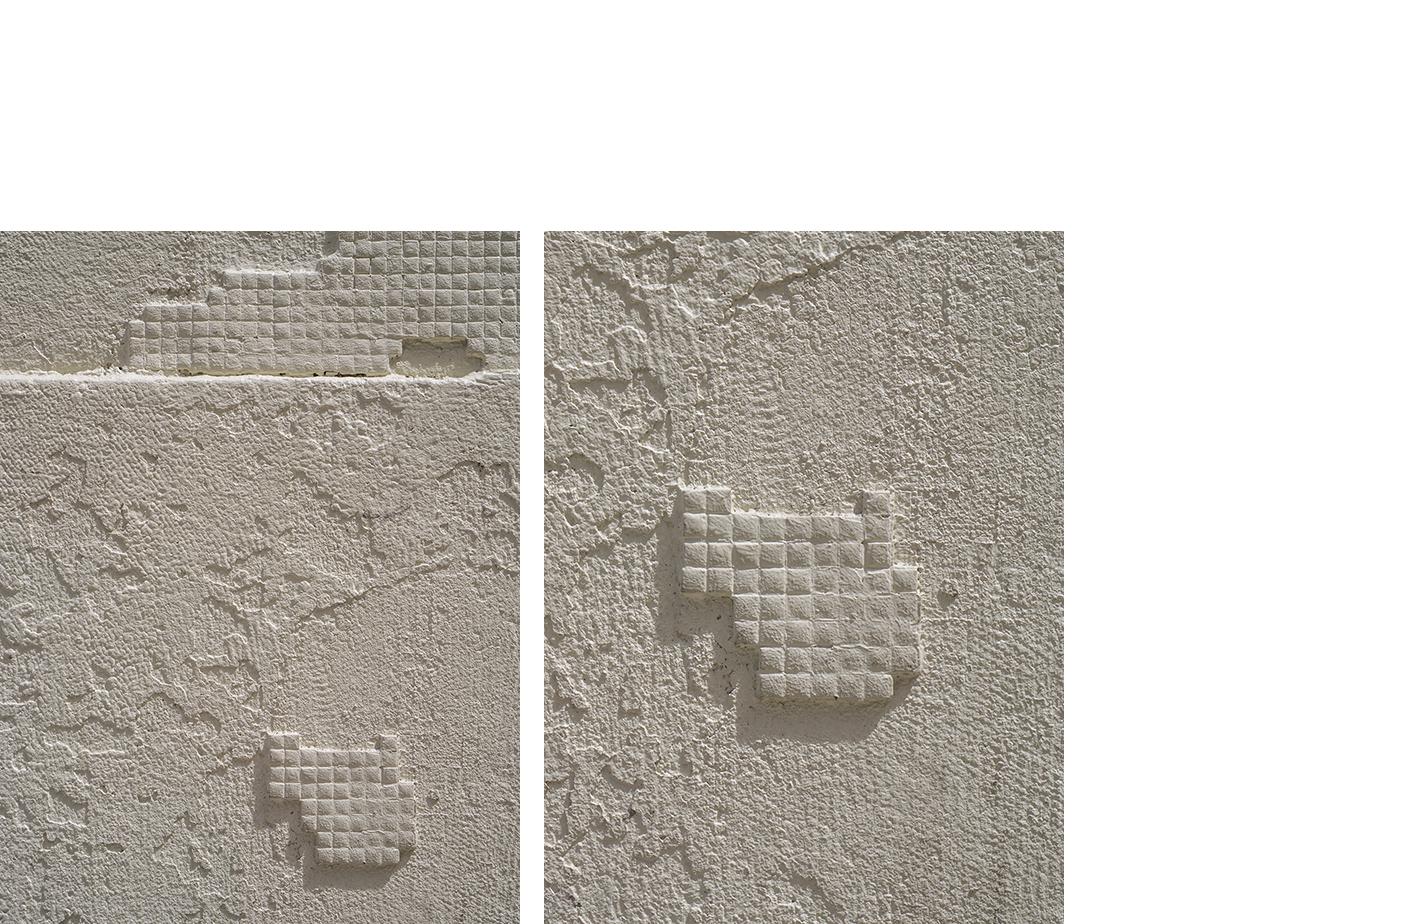 4699-31 Random Pairings #31 4699-30 Random Pairings #30  Pigment Print 5.25 x 7.00 inch Image Size 8.50 x 11.00 inch Paper Size 2 EDP / 4AP